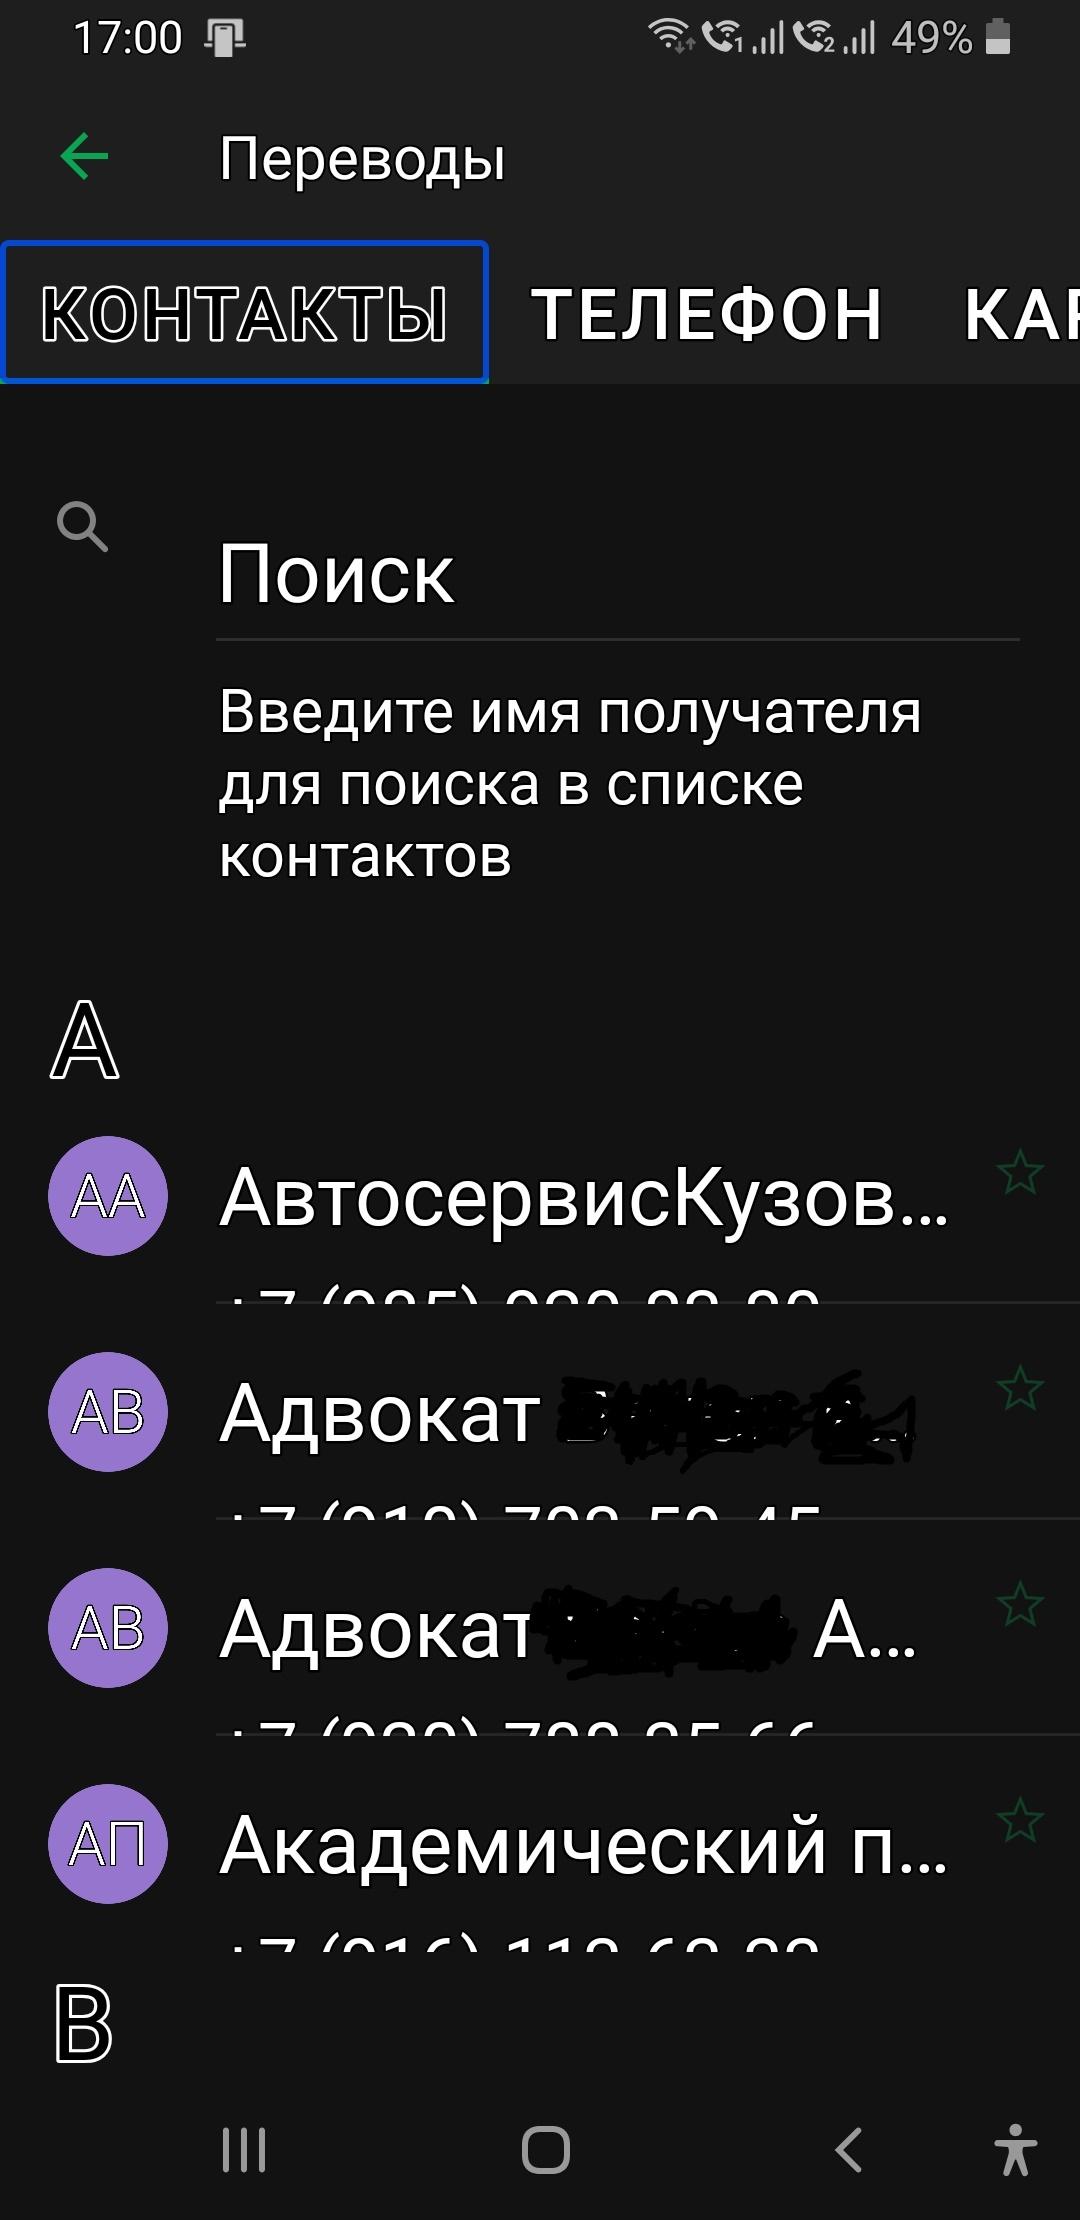 сбер_05_Перевод клиенту Сбербанка